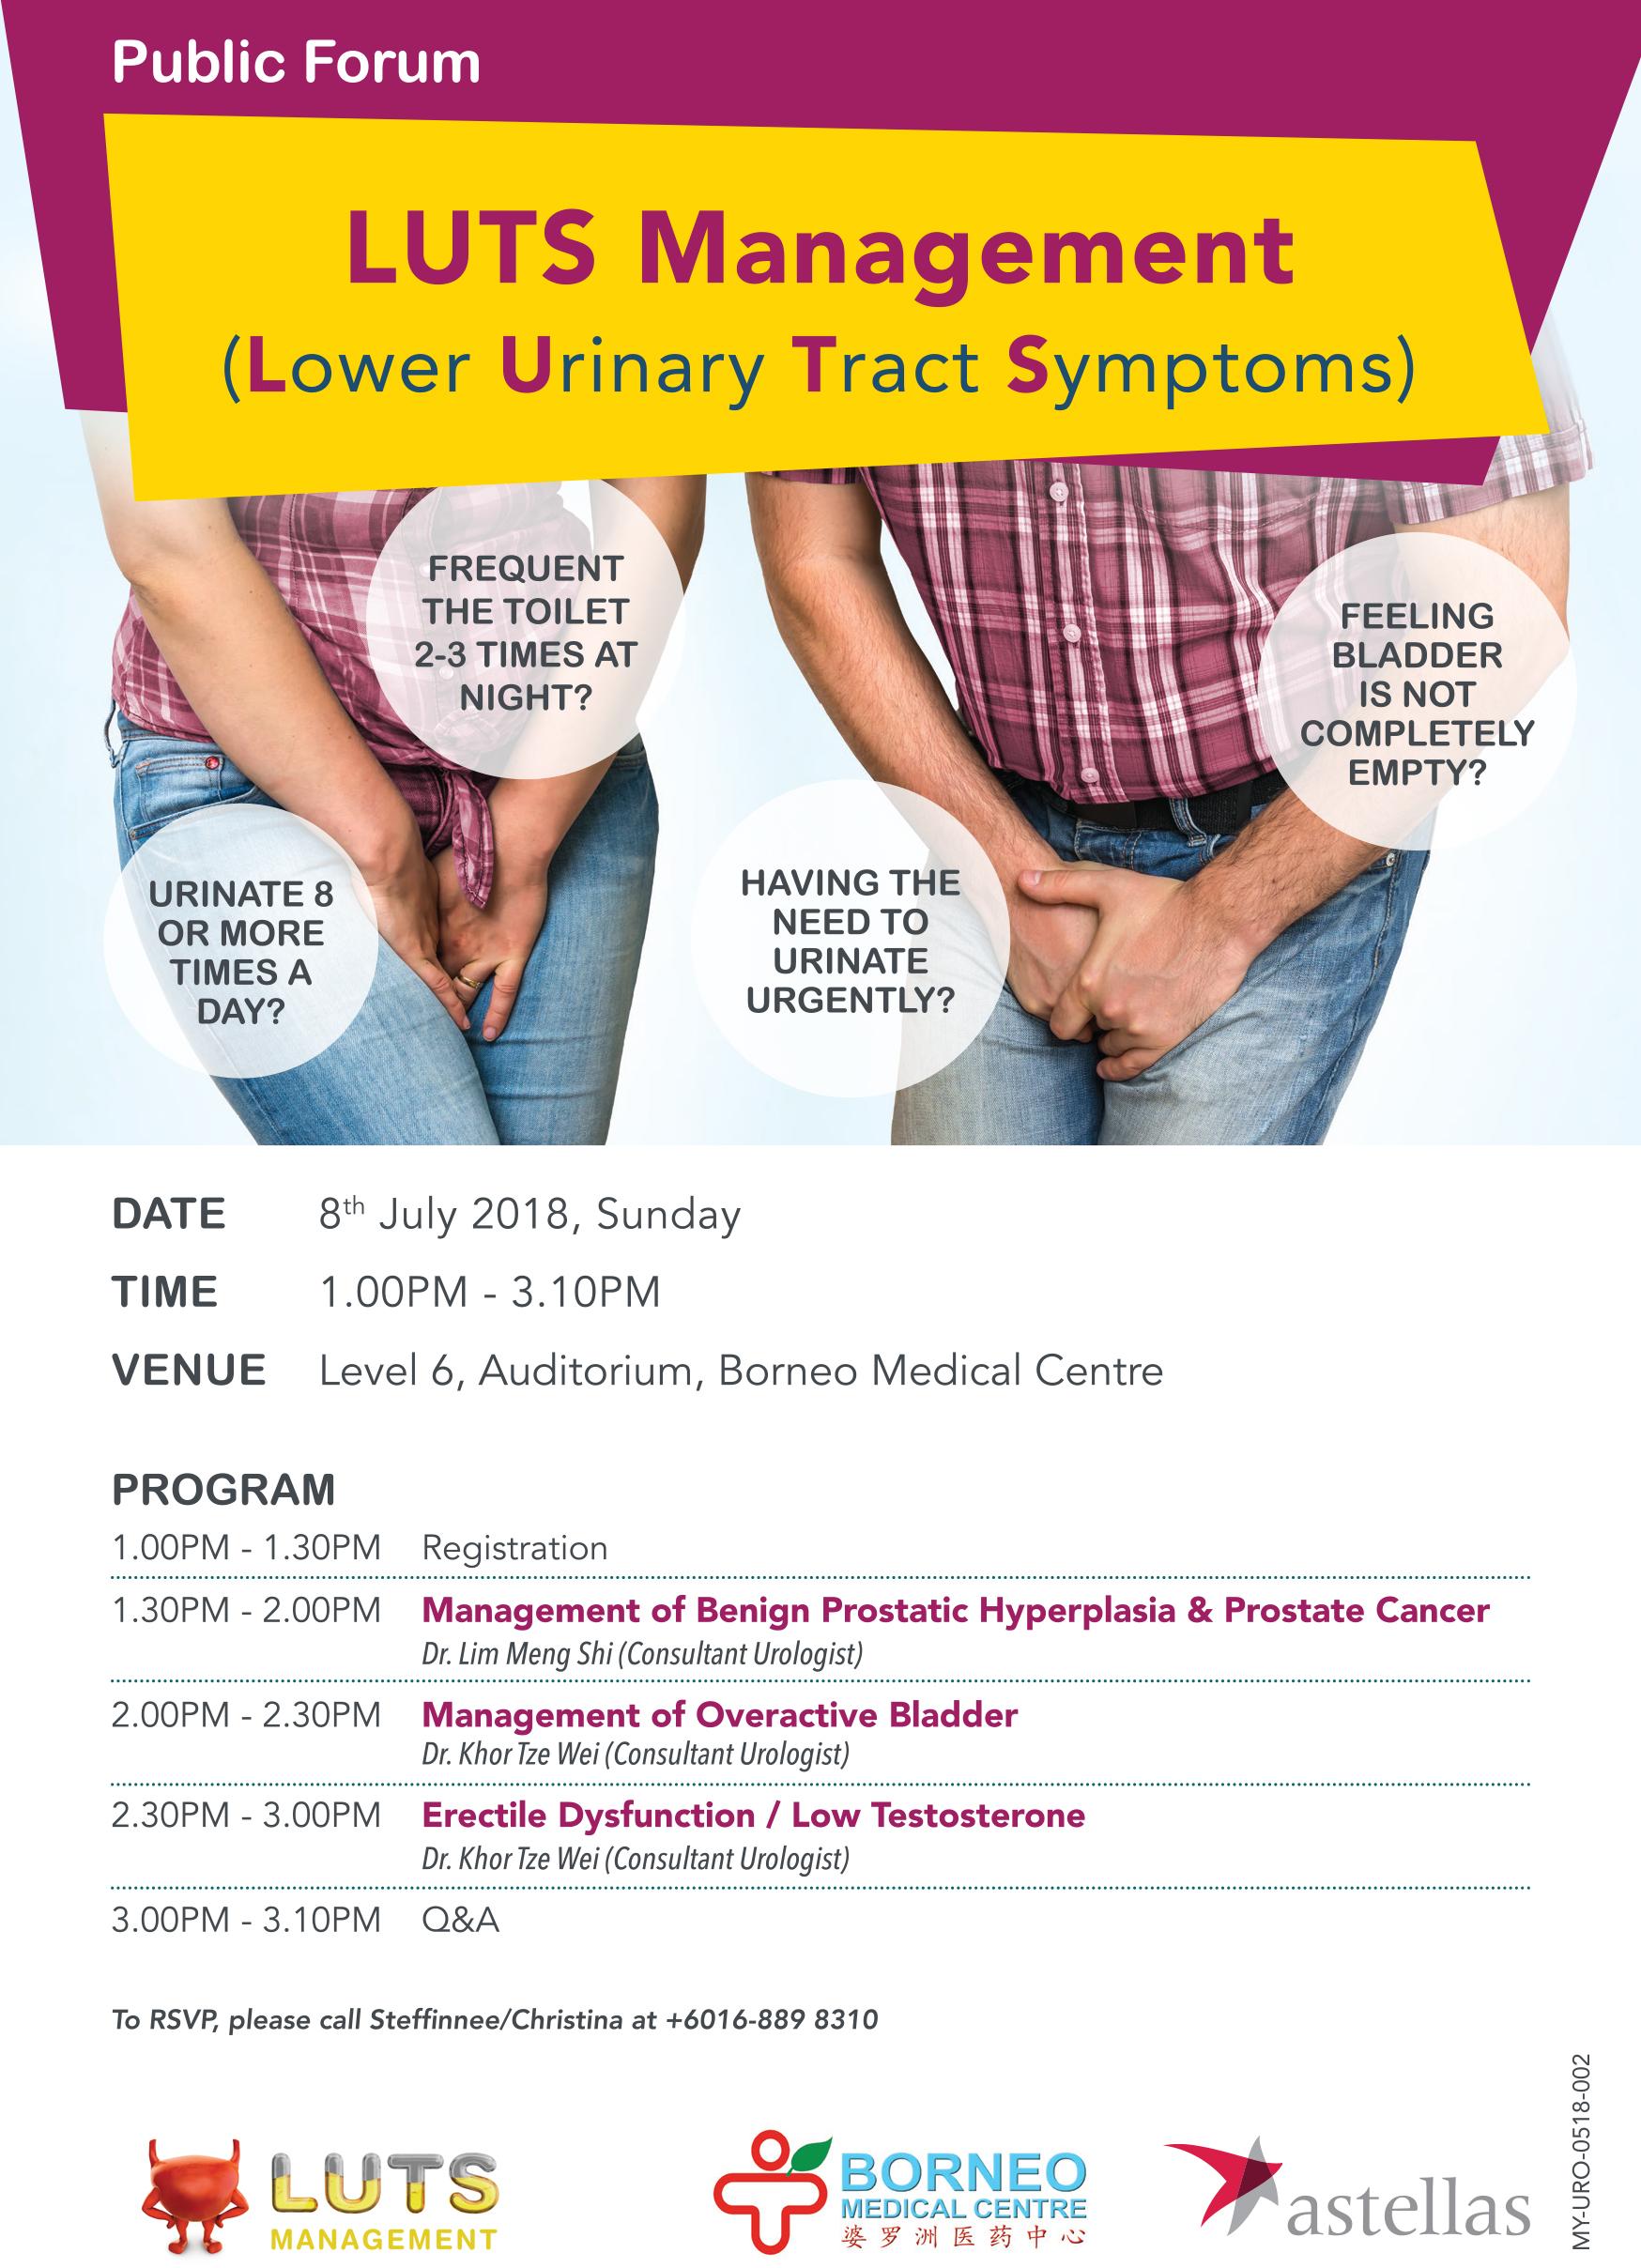 Public Forum : Lower Urinary Tract Symptoms